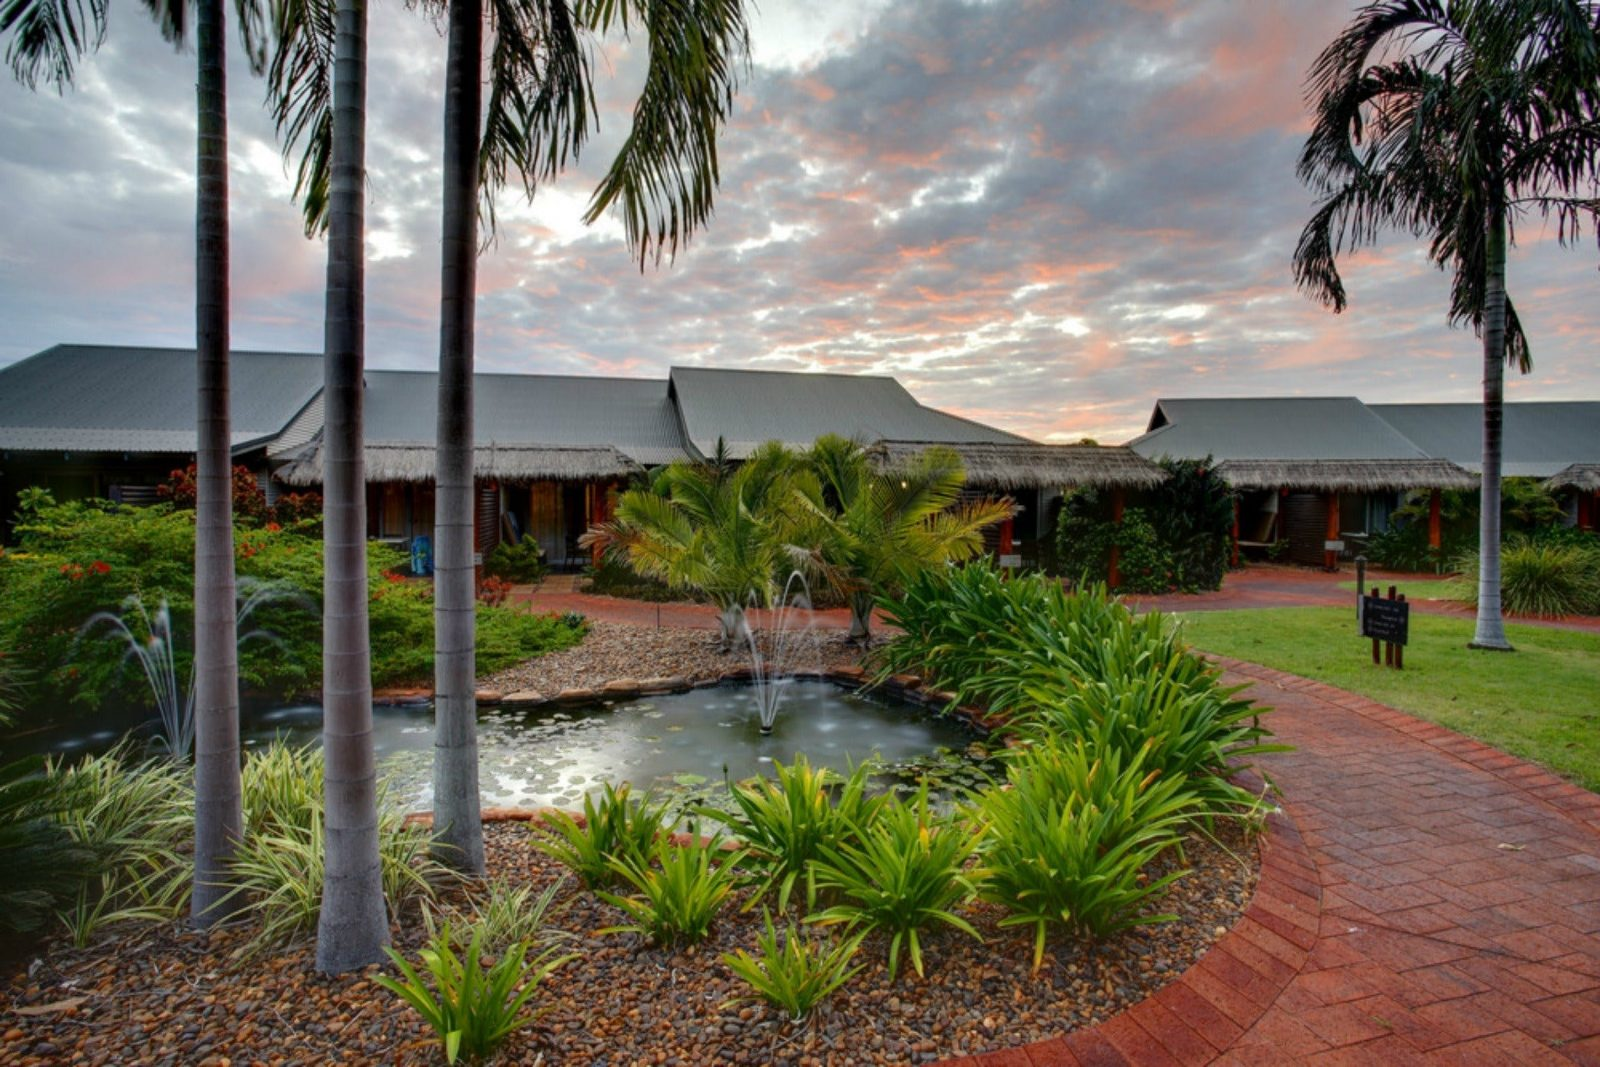 Mantra Frangipani, Broome, Western Australia